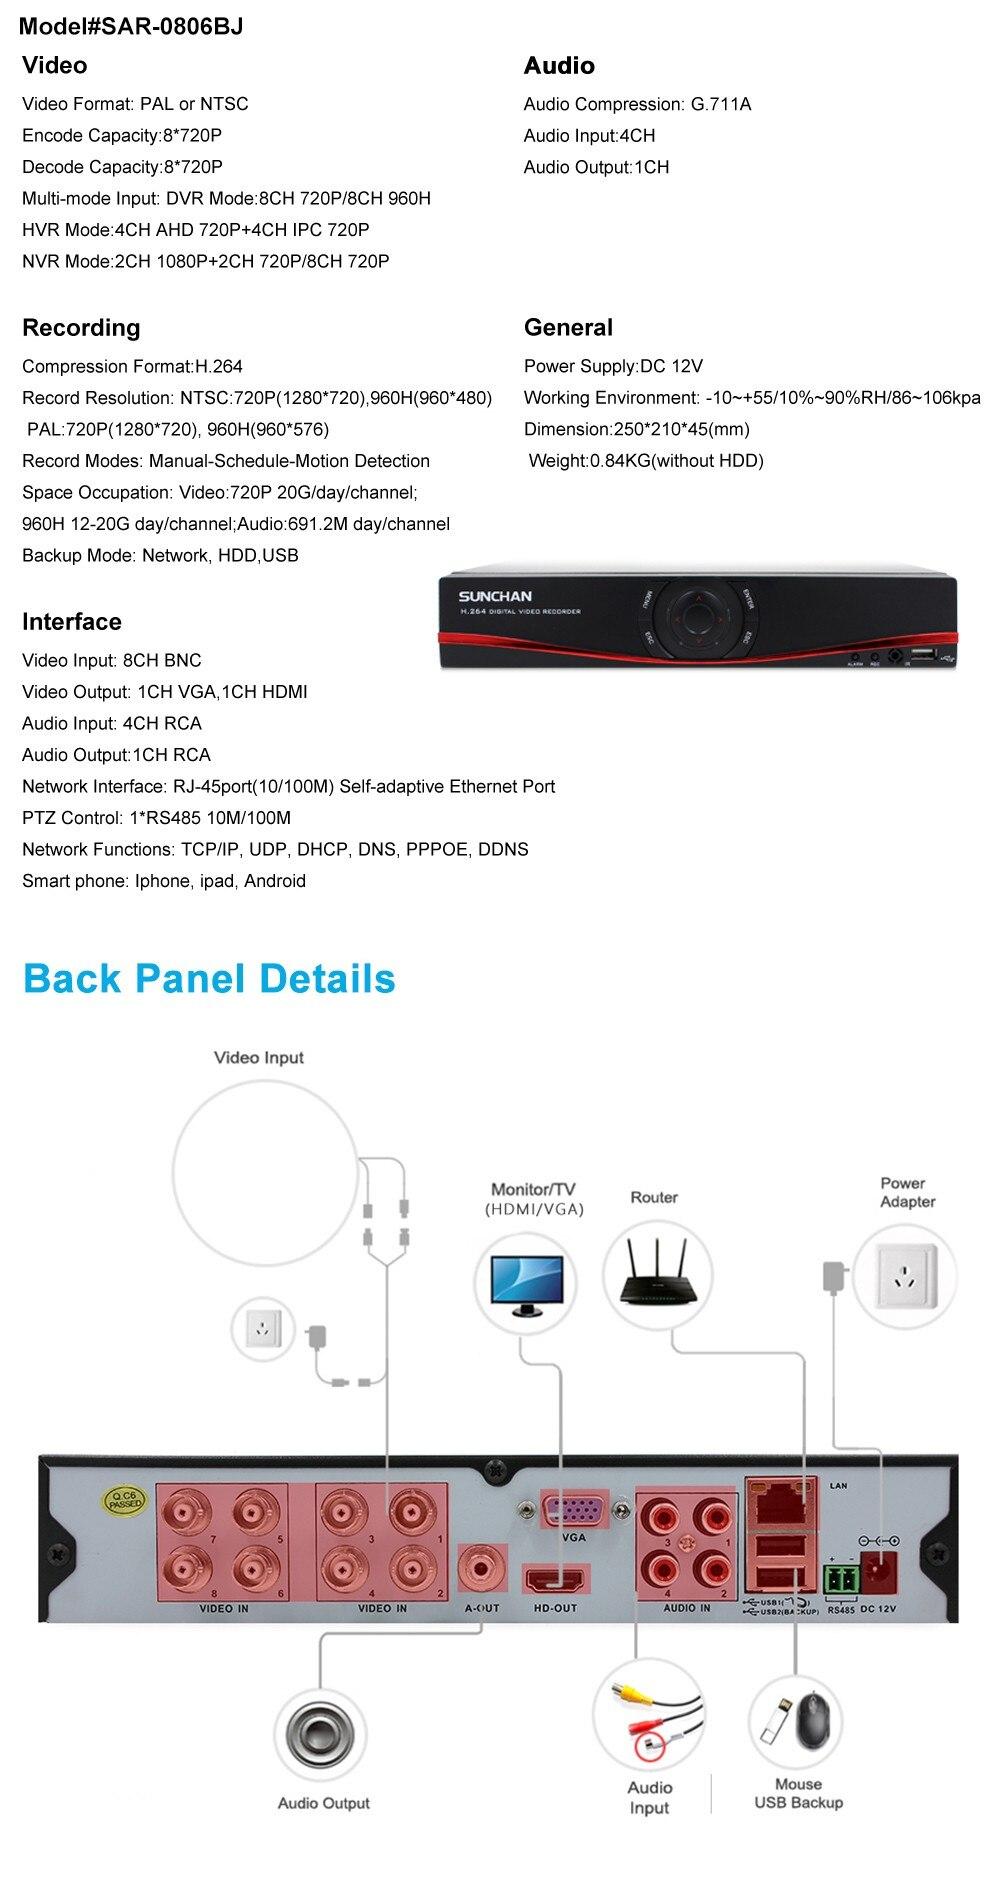 SUNCHAN HD 8CH מערכת טלוויזיה במעגל סגור 1.3 MP 720P בזמן אמת מעקב יום א DVR ערכת 8PCS חיצונית 1500TVL מצלמת אבטחה מערכת 1TB HD